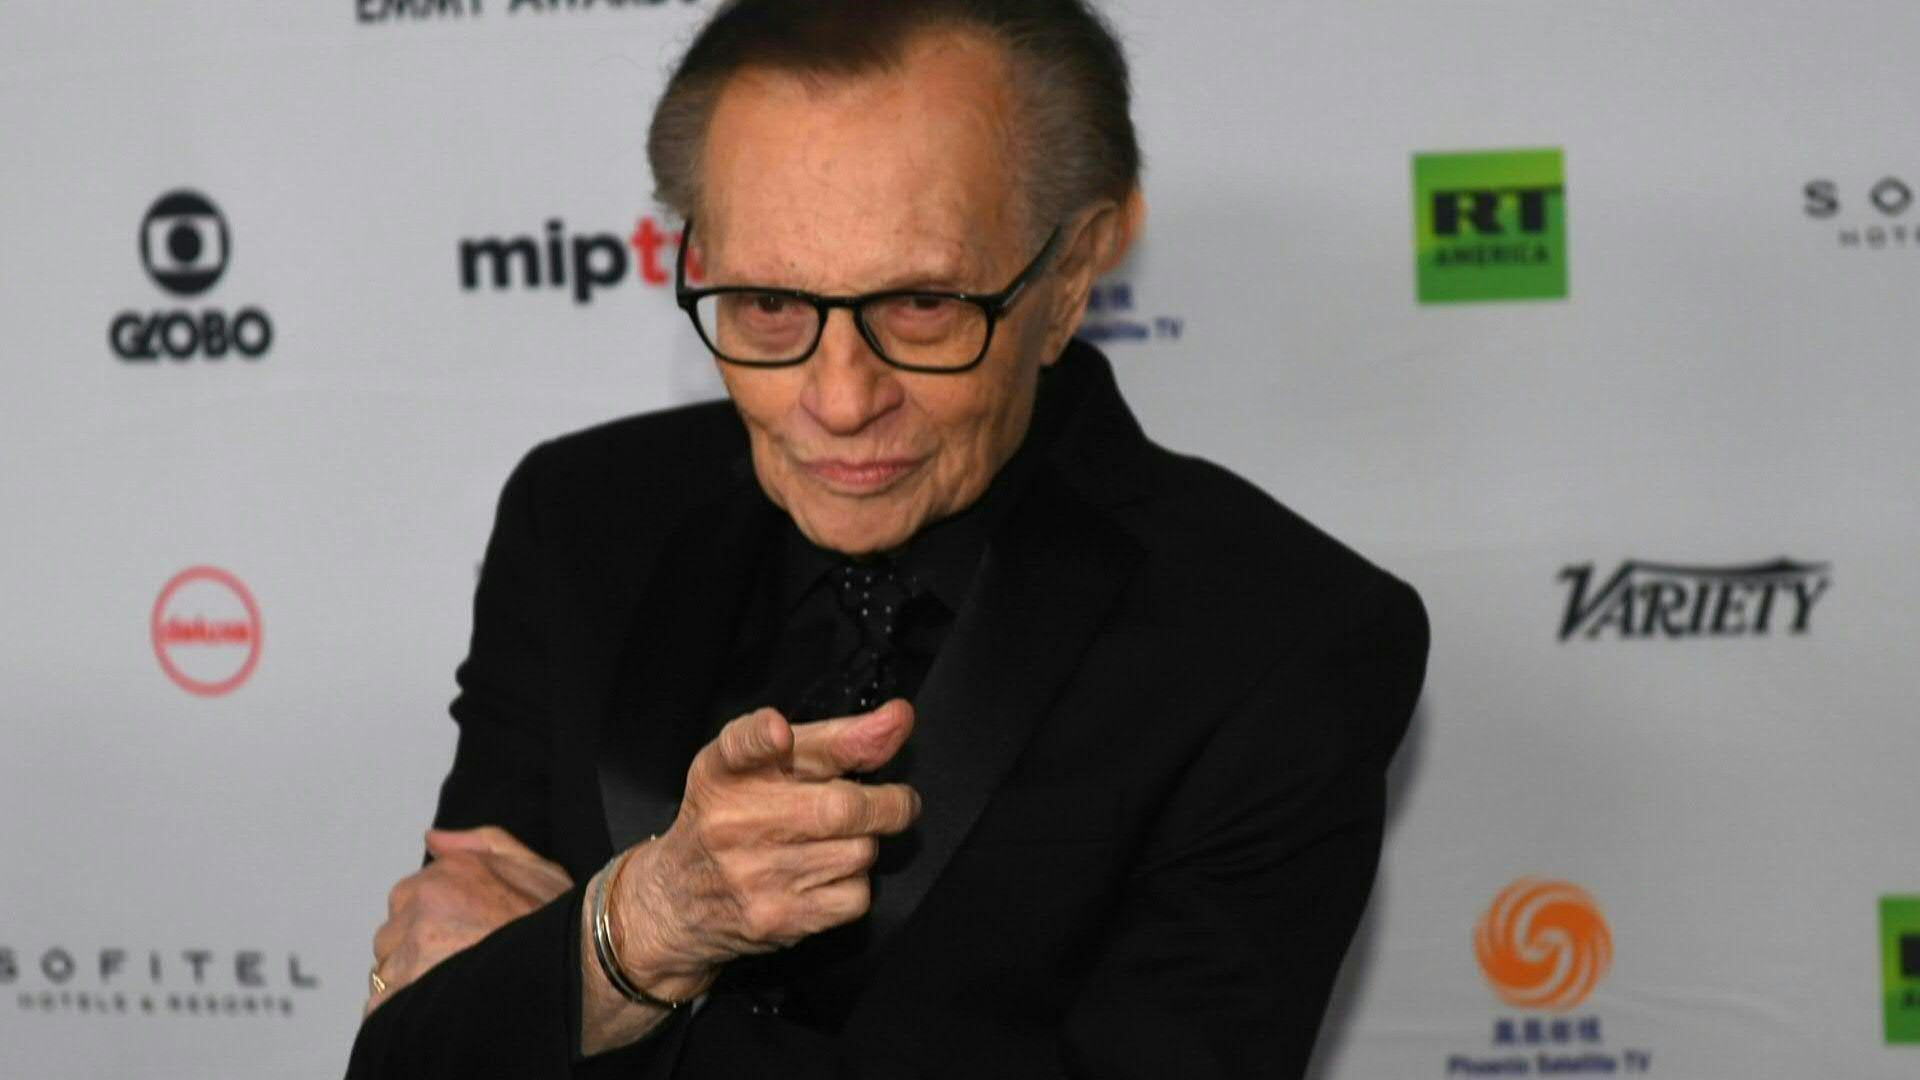 USA |Legendärer TV-Journalist Larry King ist tot